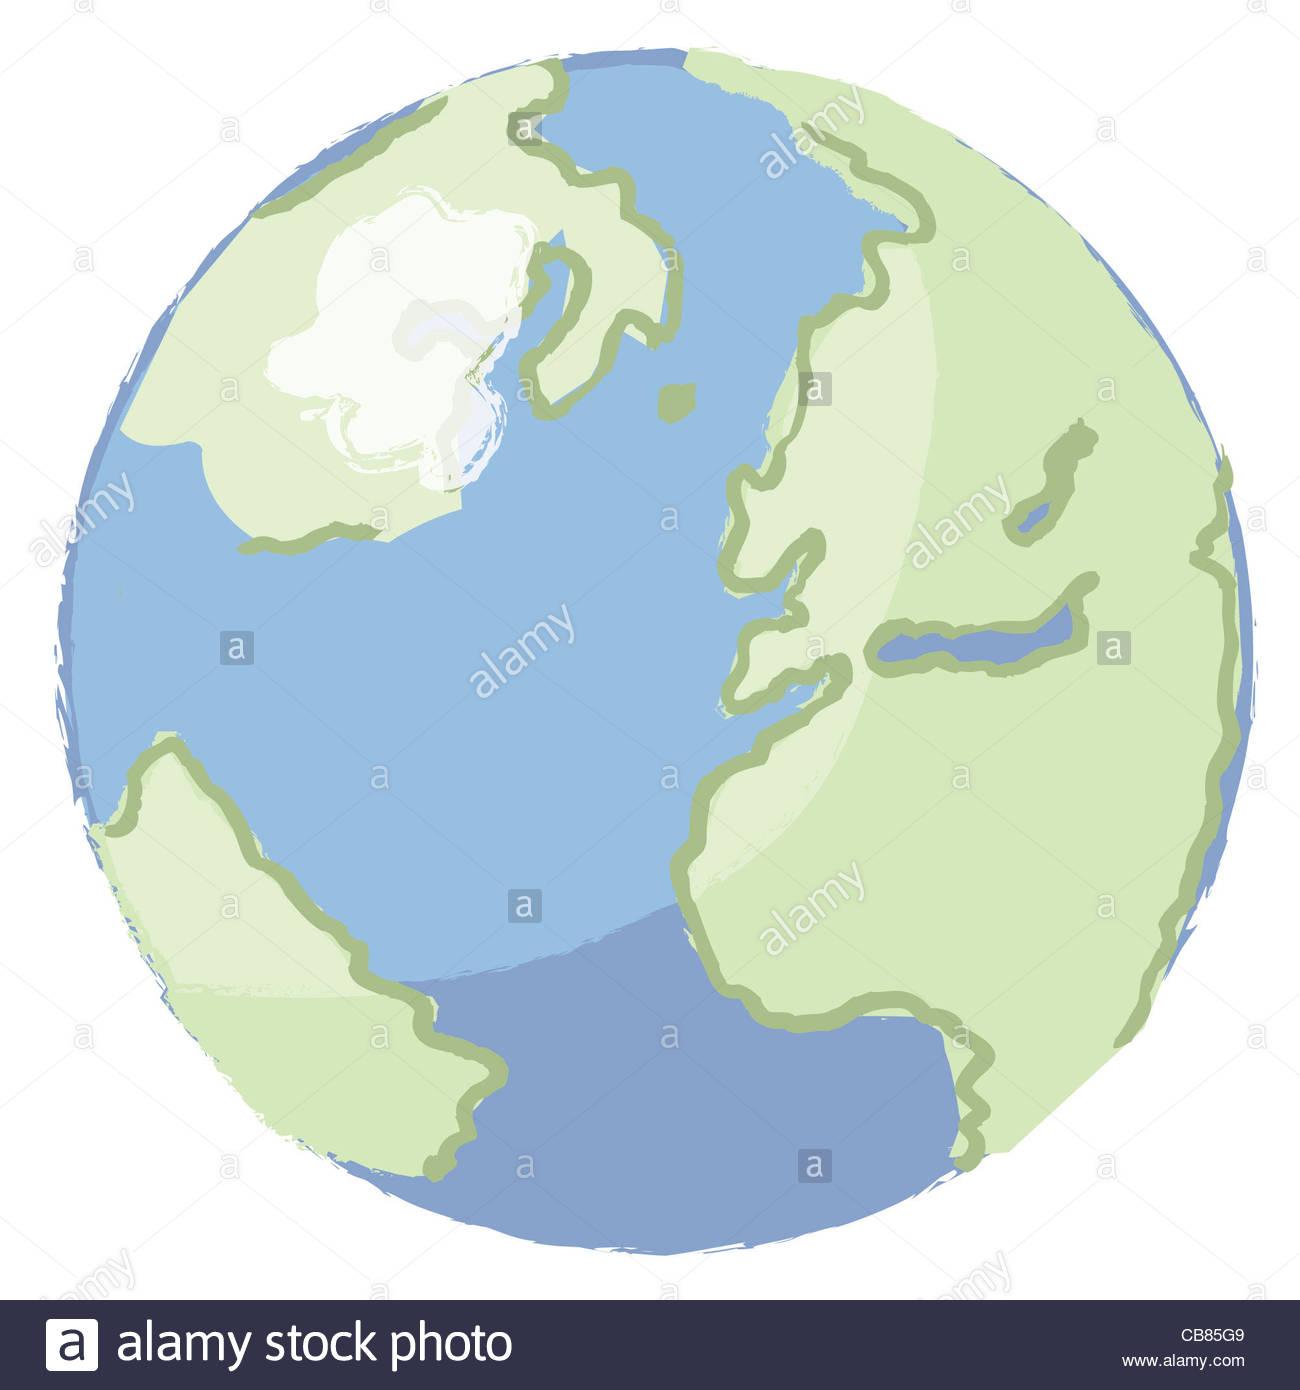 Earth globe globe geography globe globe world map map software stock earth globe globe geography globe globe world map map software geography ge gumiabroncs Images